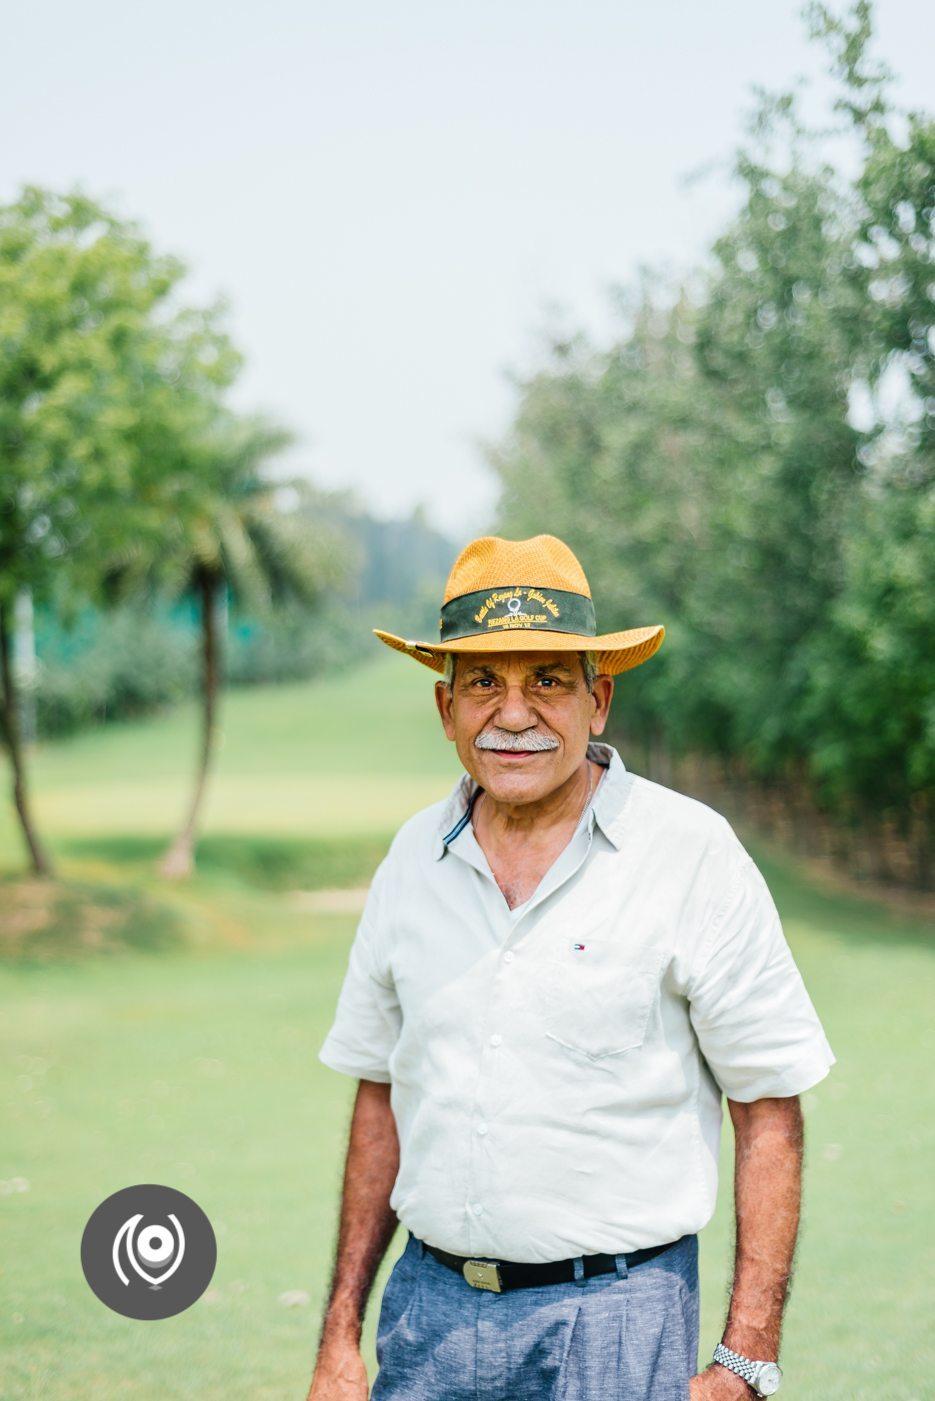 NainaCo-Cotton-Council-International-LiveInCotton-Luxury-Lifestyle-Raconteuse-Photographer-Storyteller-VP-Singh-01